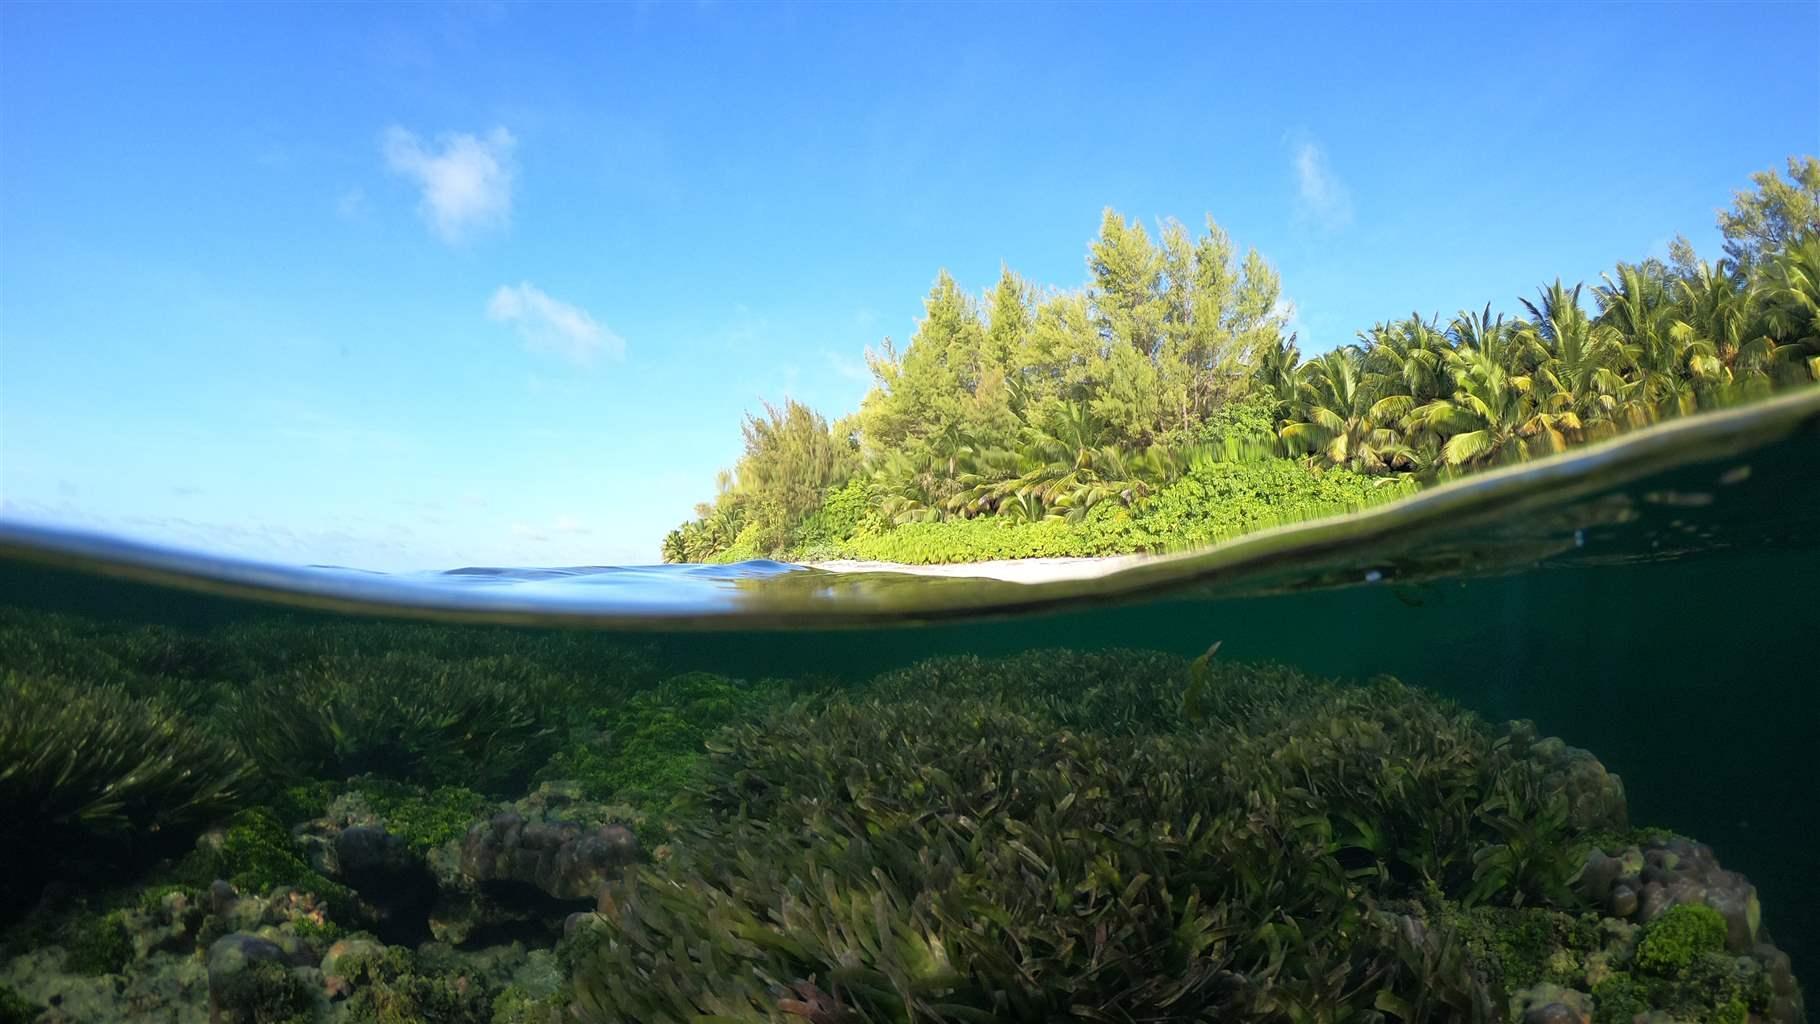 Seychelles seagrass